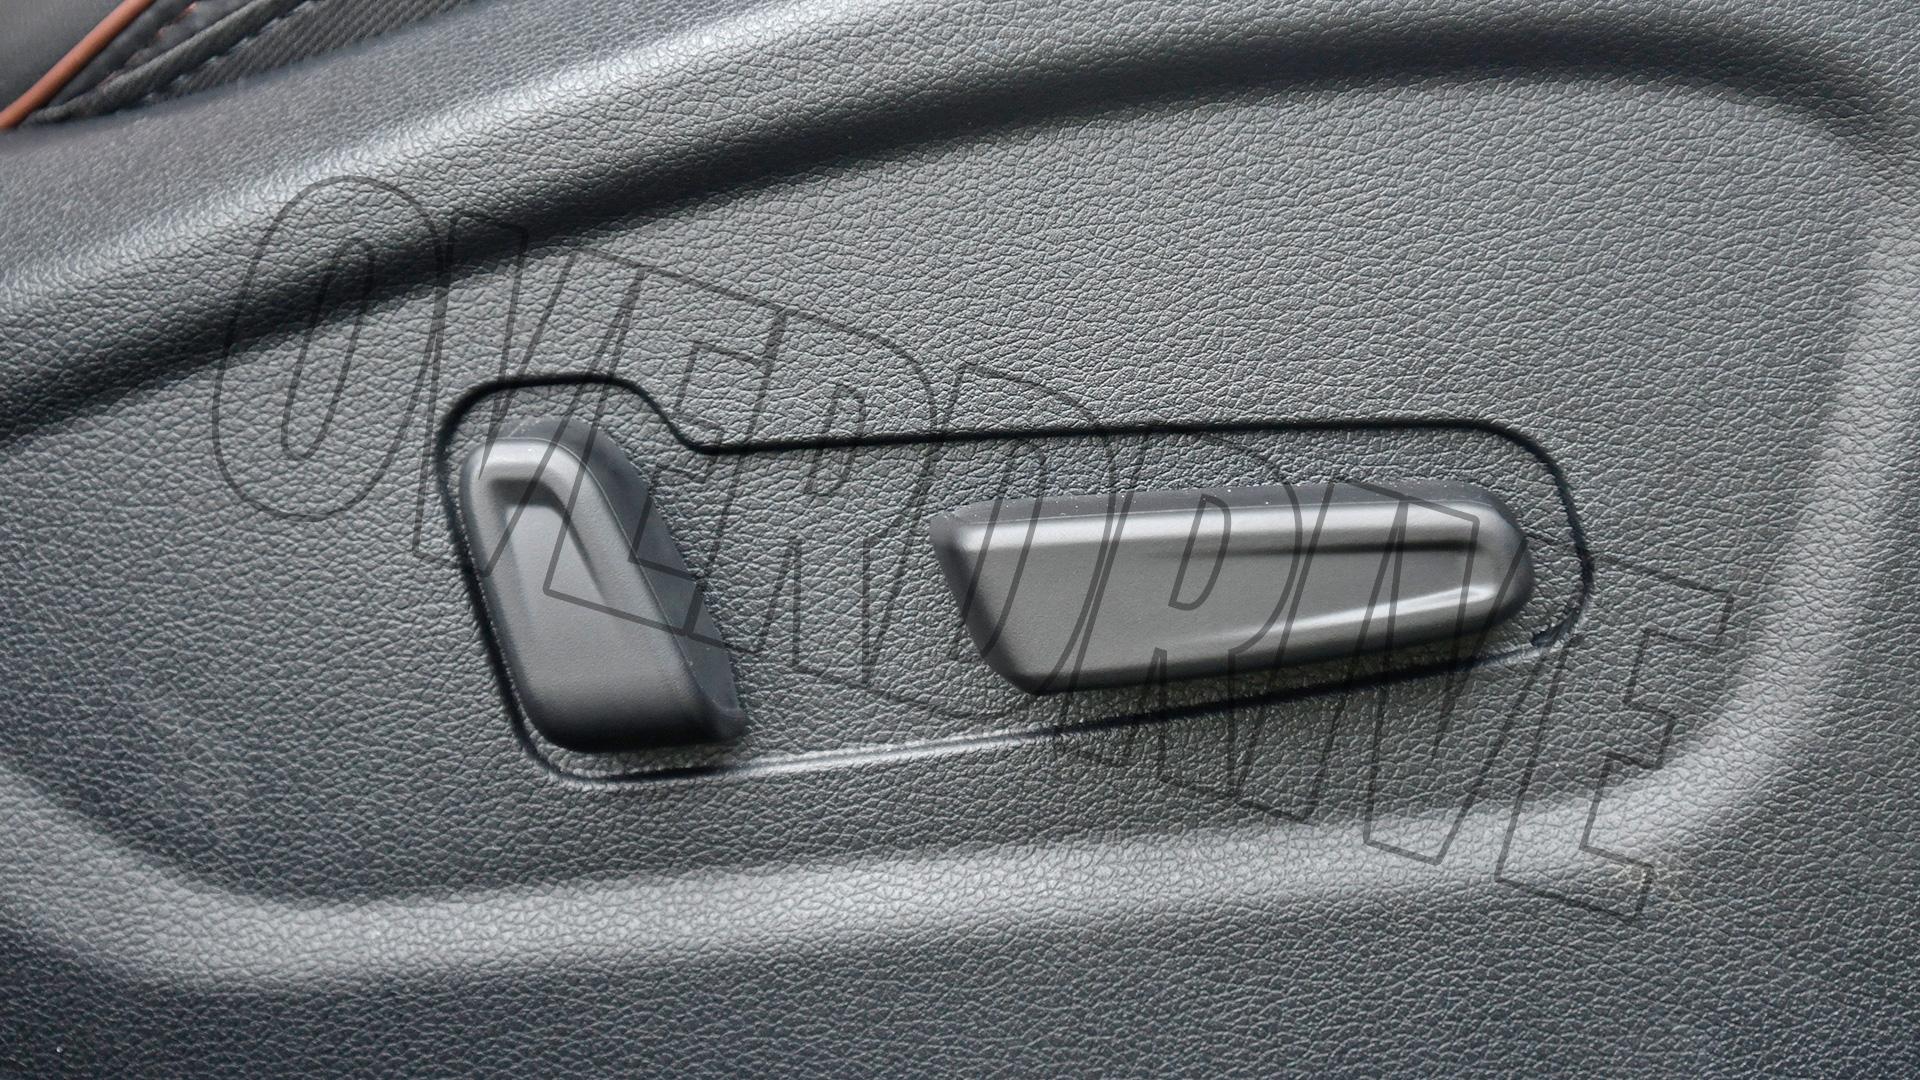 Hyundai Alcazar 2021 1.5 Diesel Interior